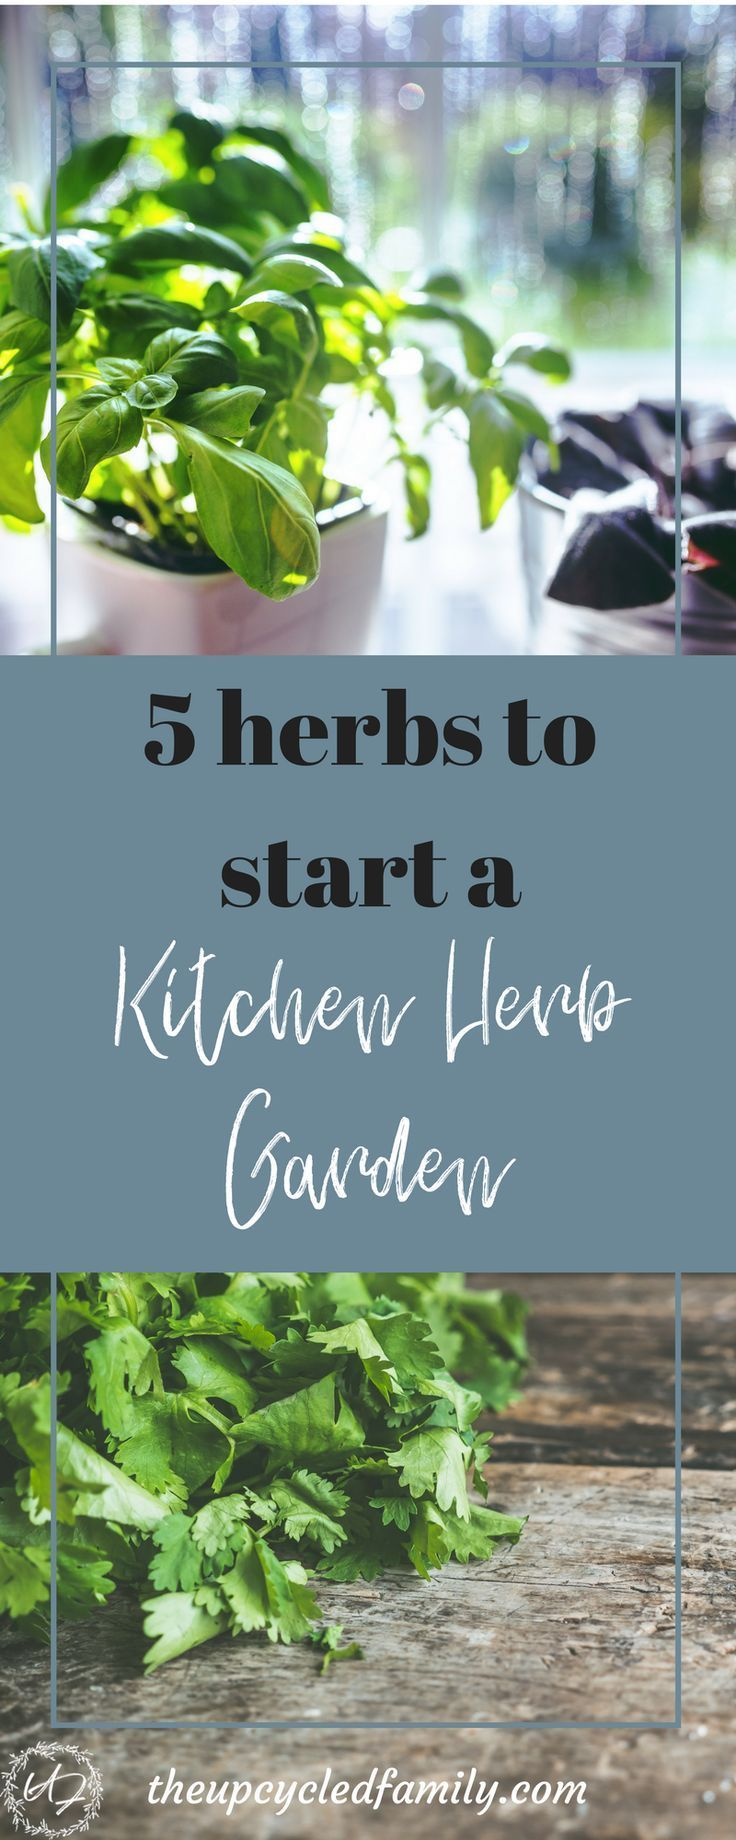 5 easy herbs to grow in your kitchen herb garden   Herbs, Gardens ...